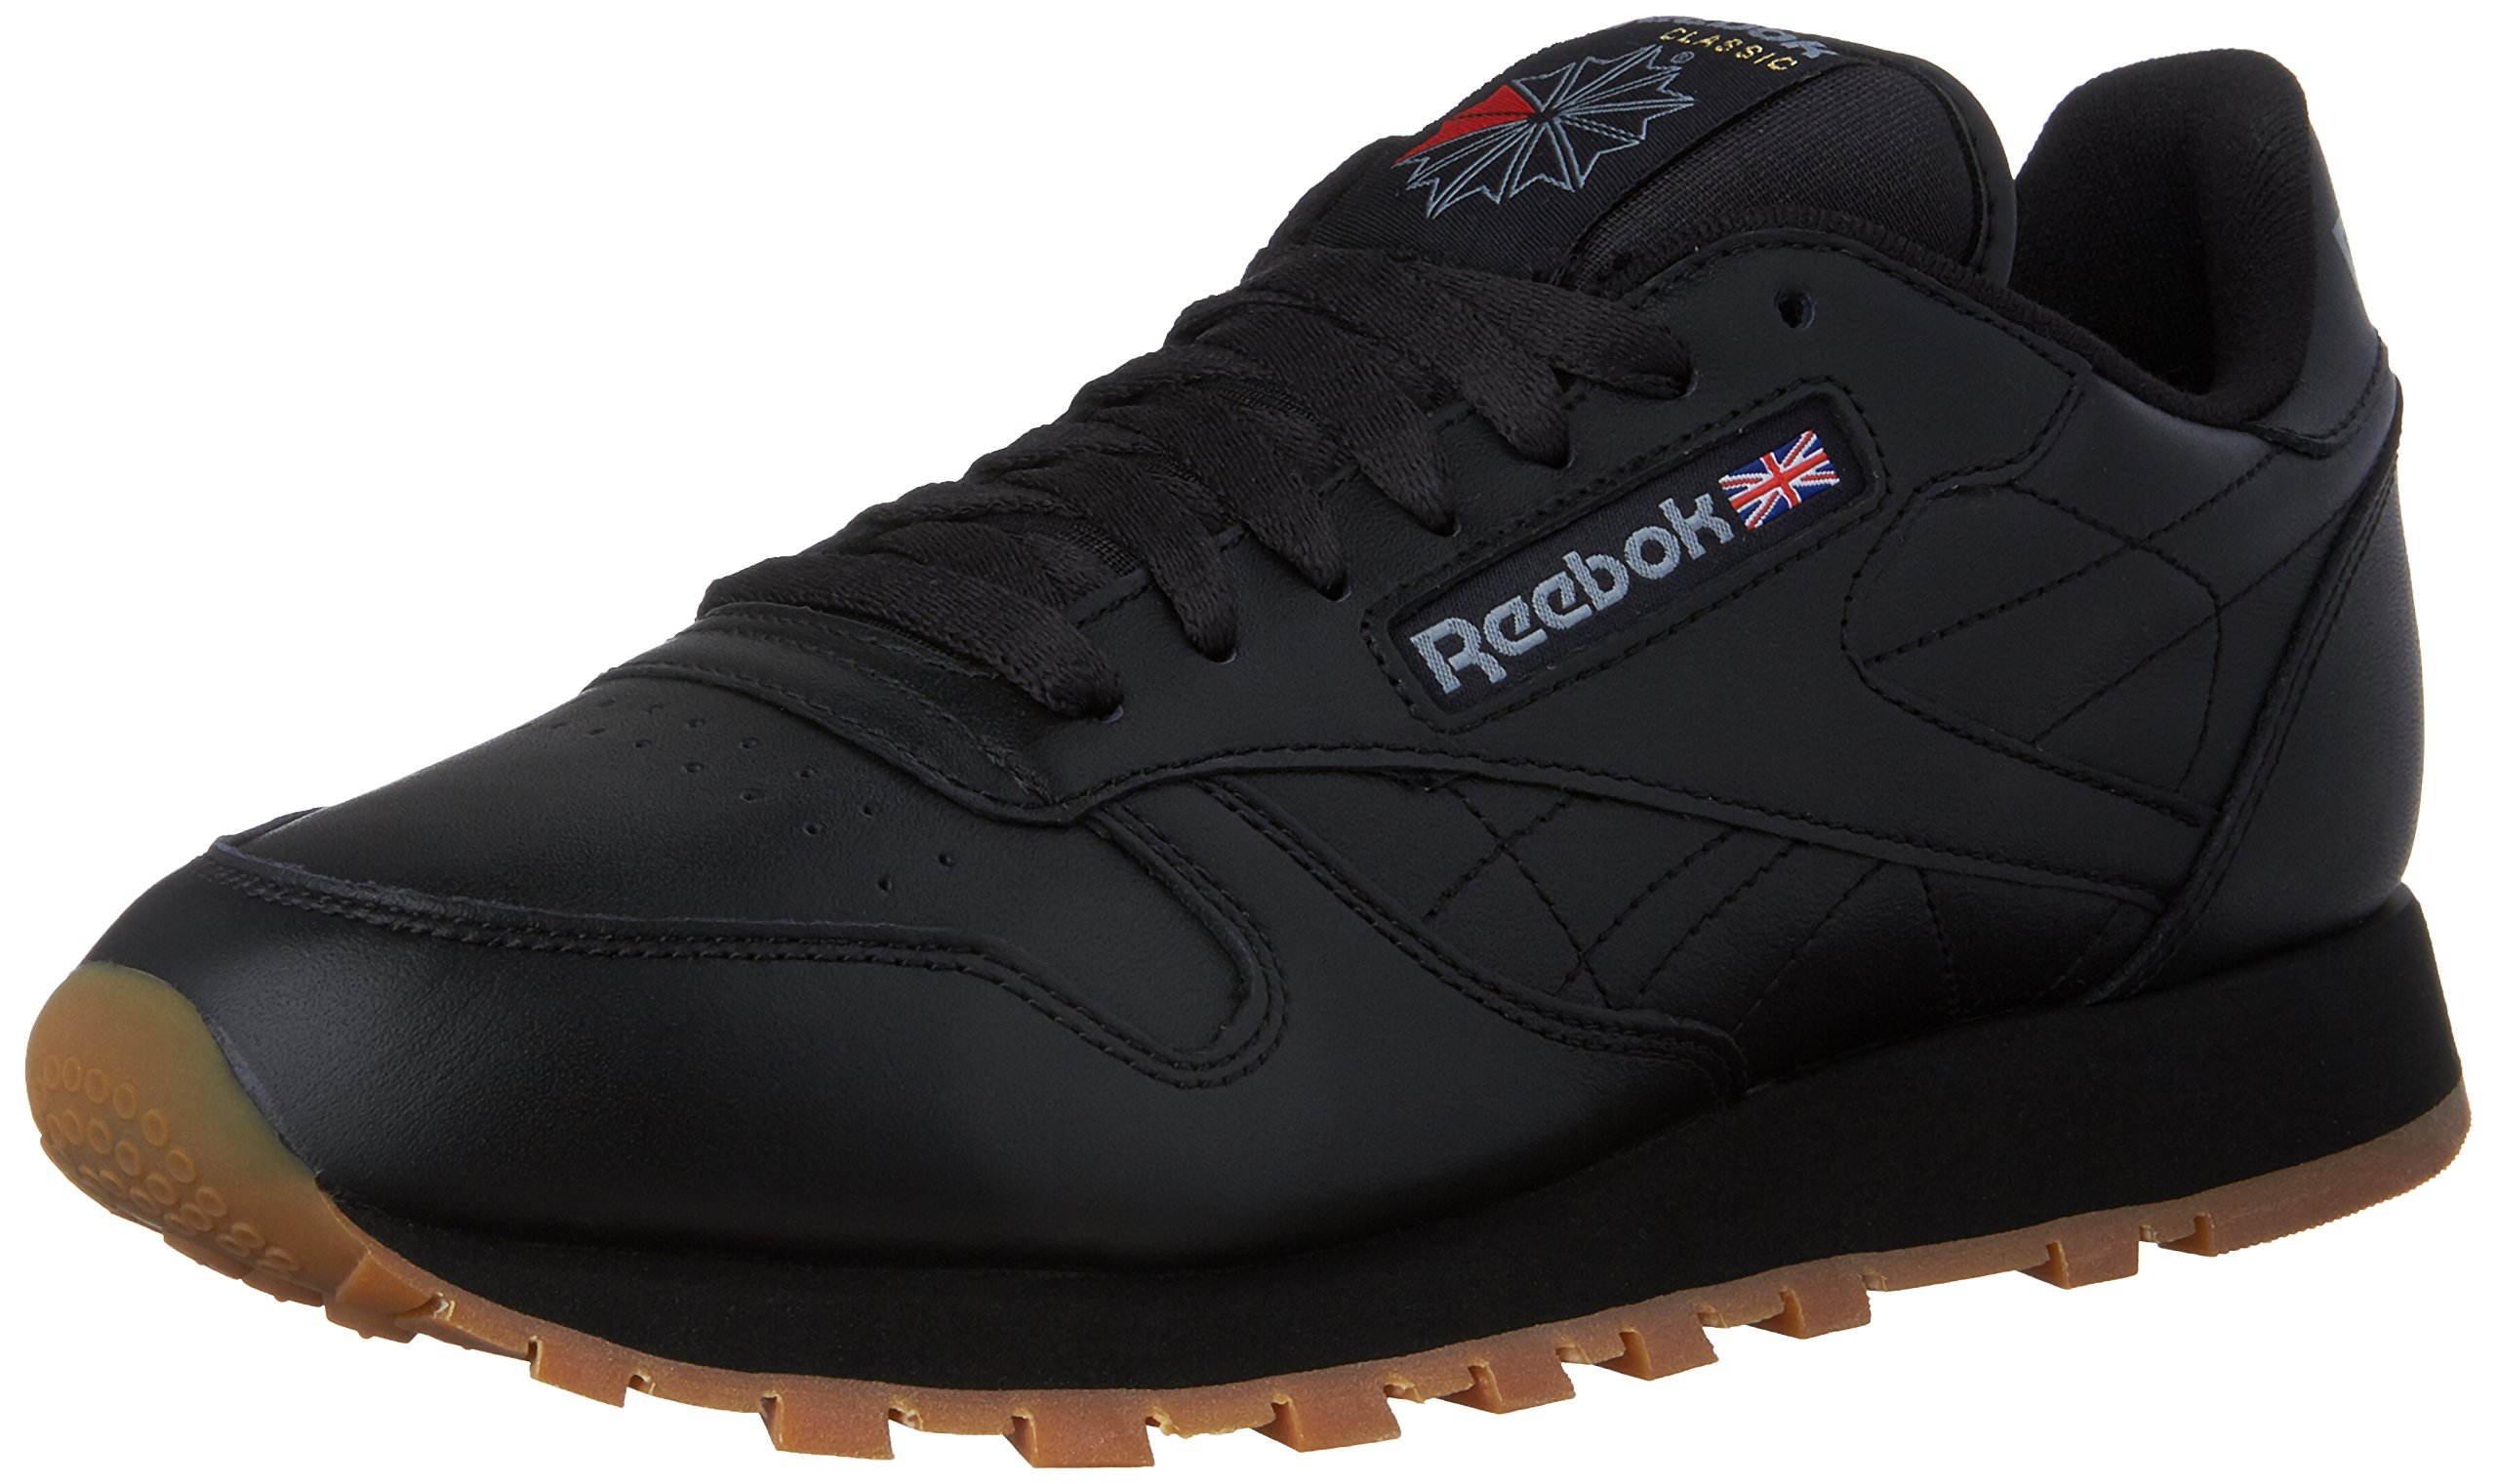 Reebok Men's Classic Leather Sneaker, Black/Gum, 6.5 M US